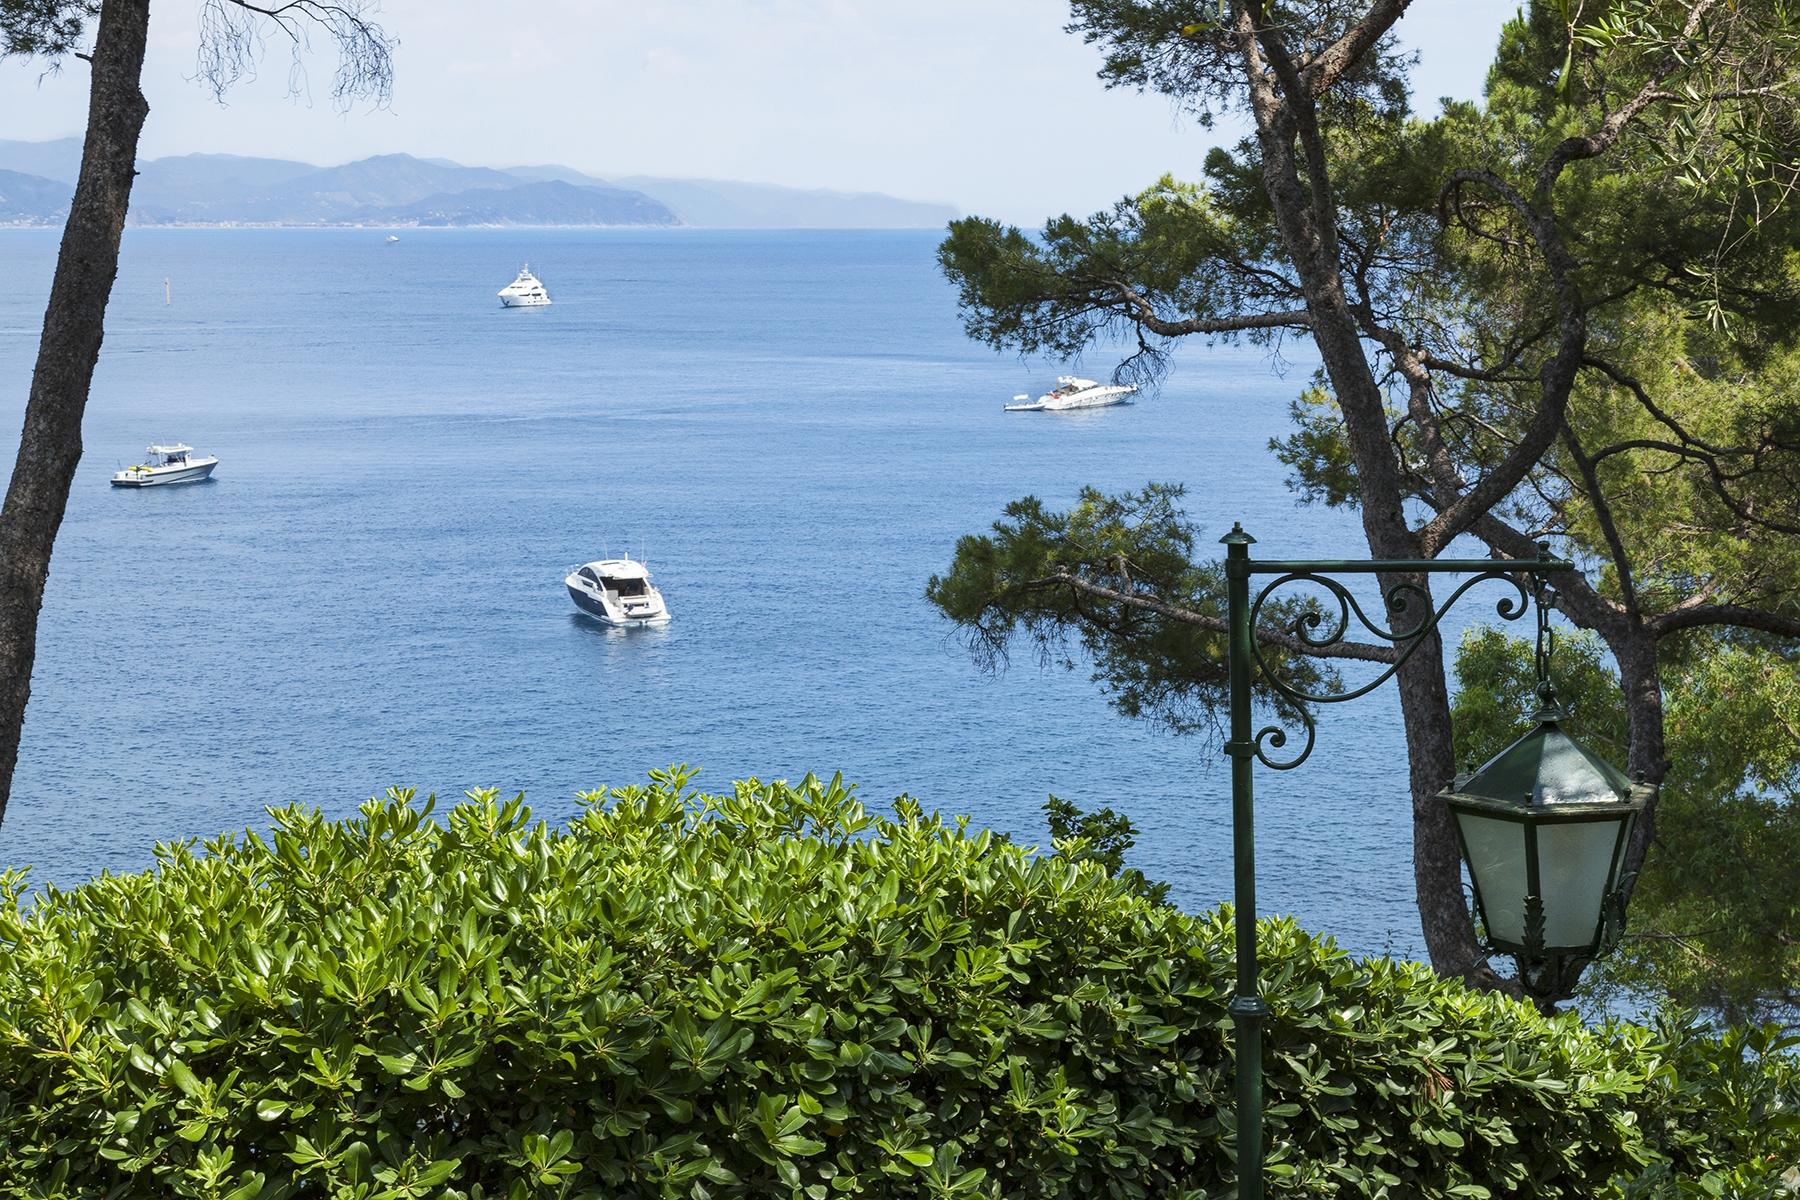 Villa in Vendita a Santa Margherita Ligure: 5 locali, 580 mq - Foto 5